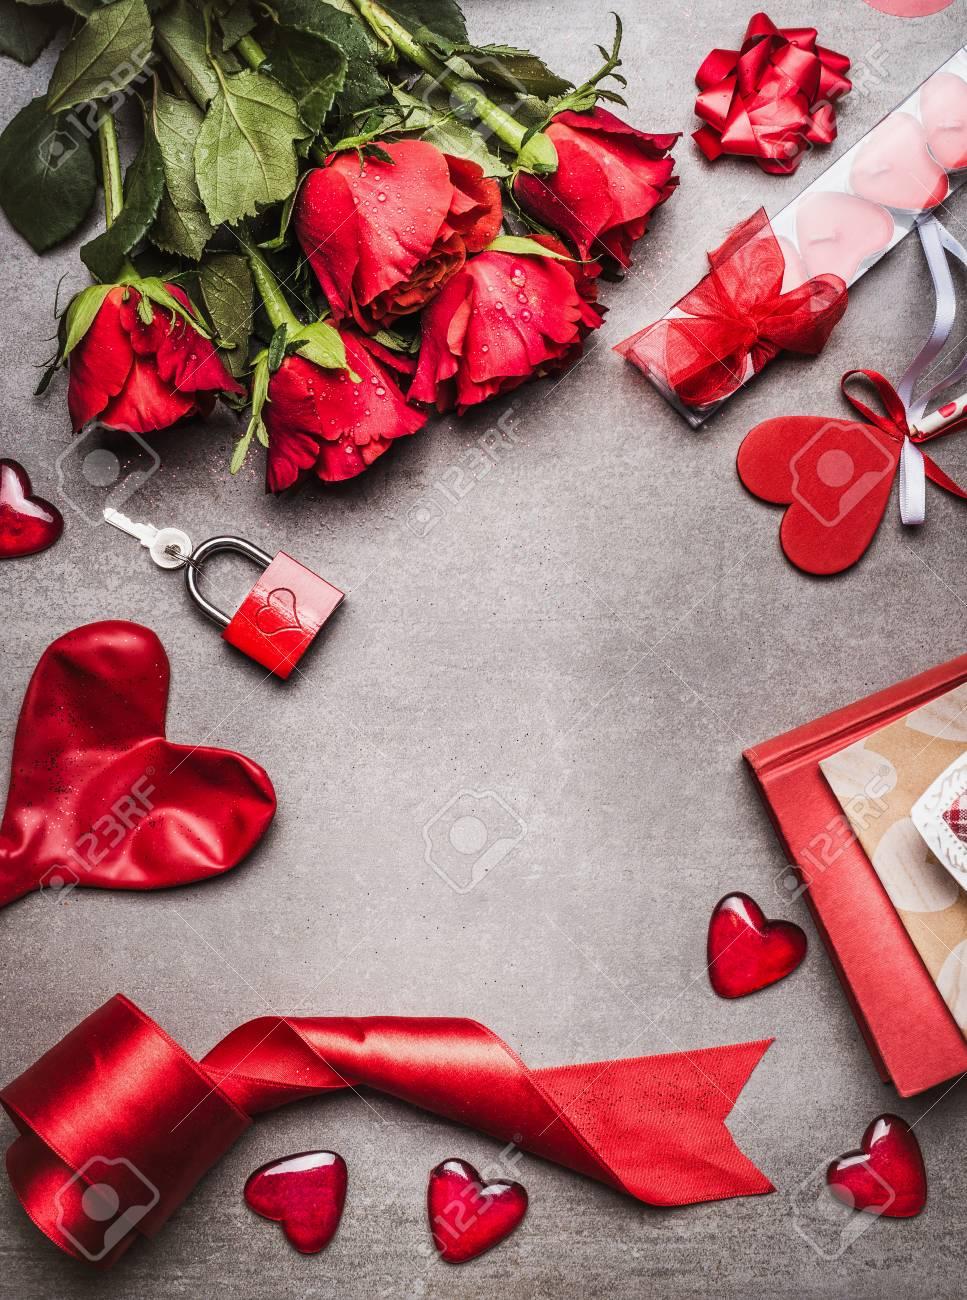 Fondo Del Dia De San Valentin Con Simbolos De Amor Decoracion Roja - Decoracion-san-valentin